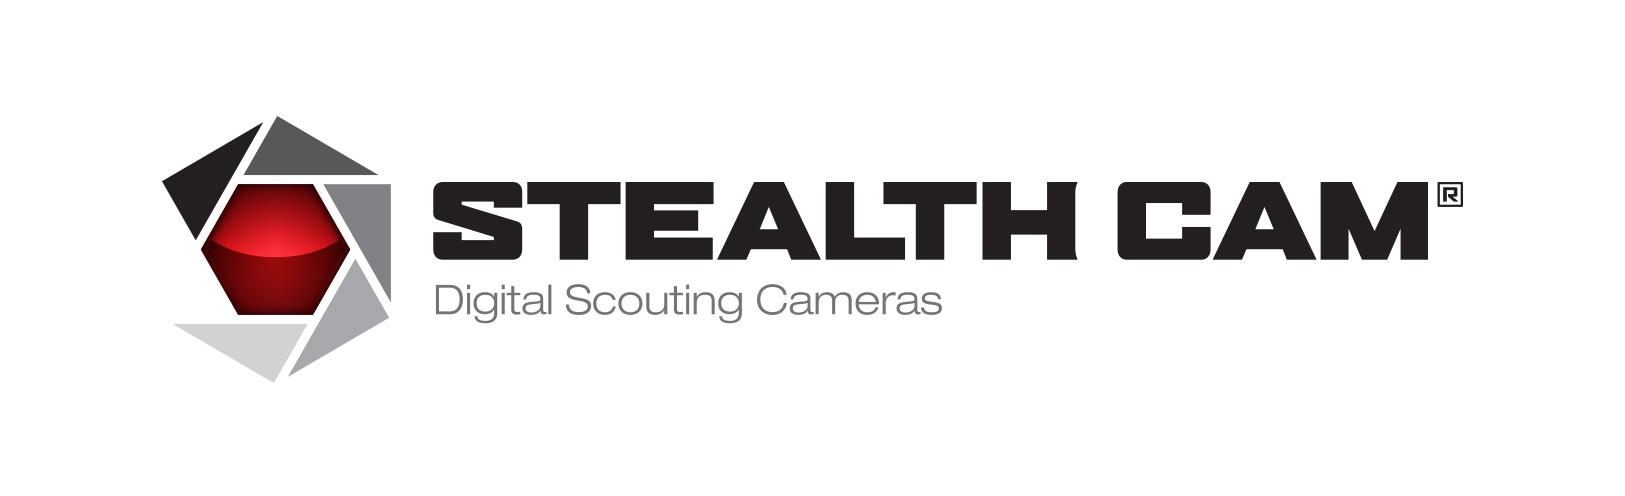 Stealth Cam Logo